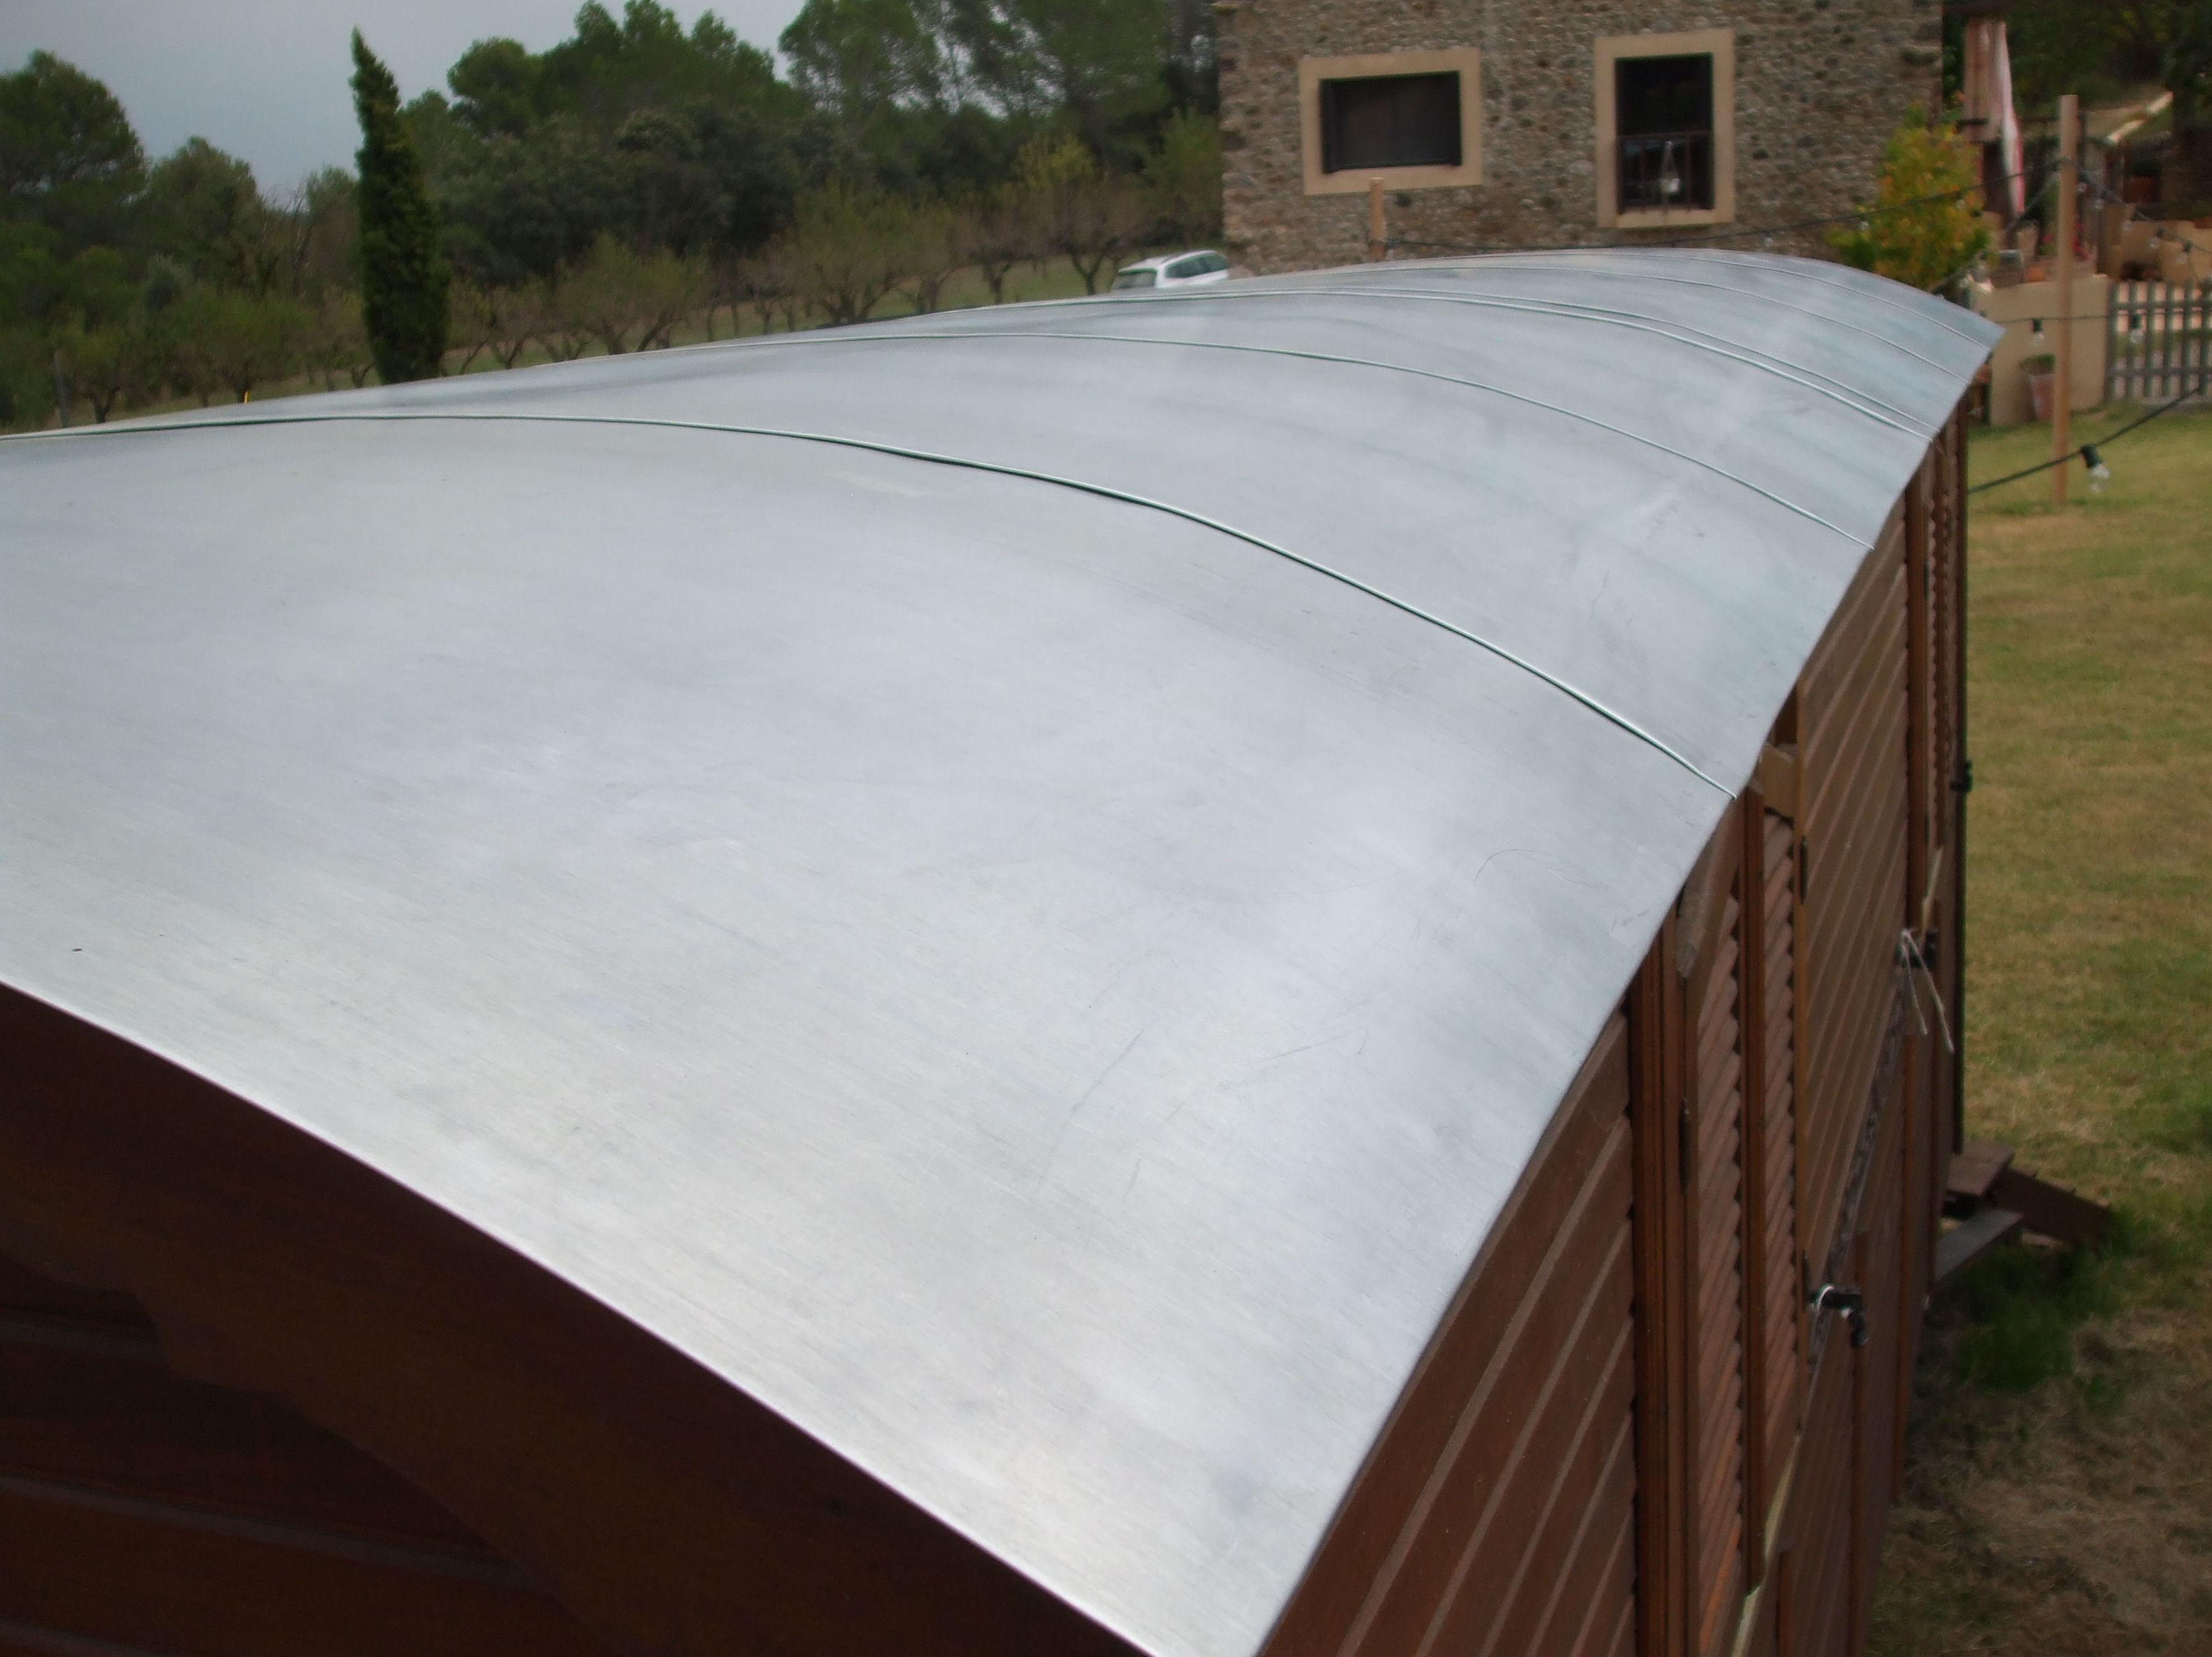 Cubierta junta plana de zinc en carabana antigua